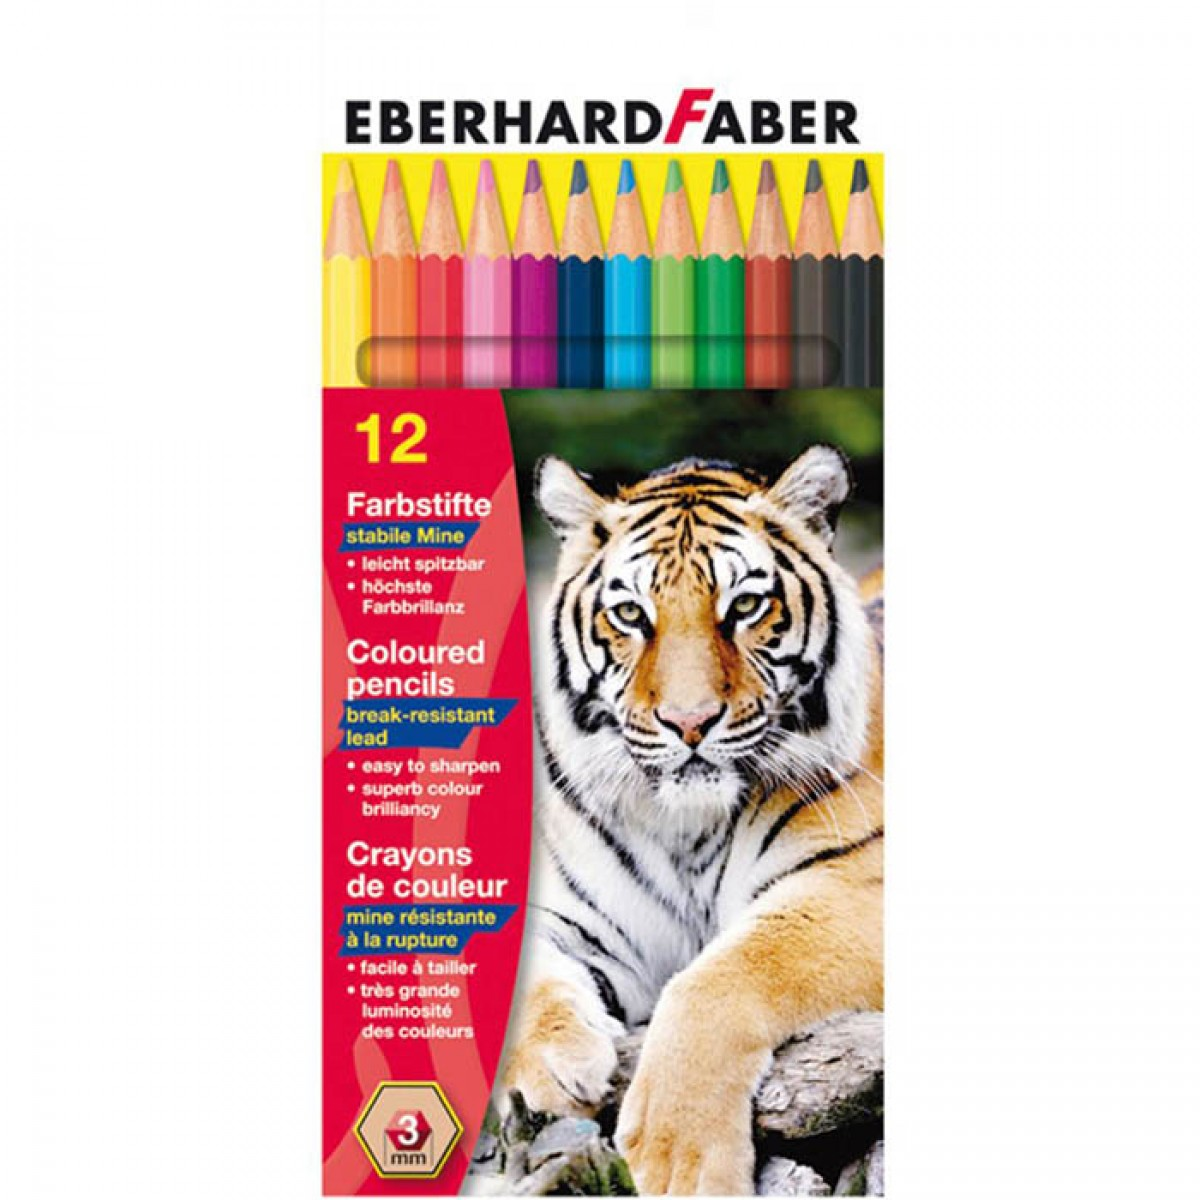 Eberhard Faber Ξυλομπογιές 3mm (12 Τεμ.) Ξυλομπογιές